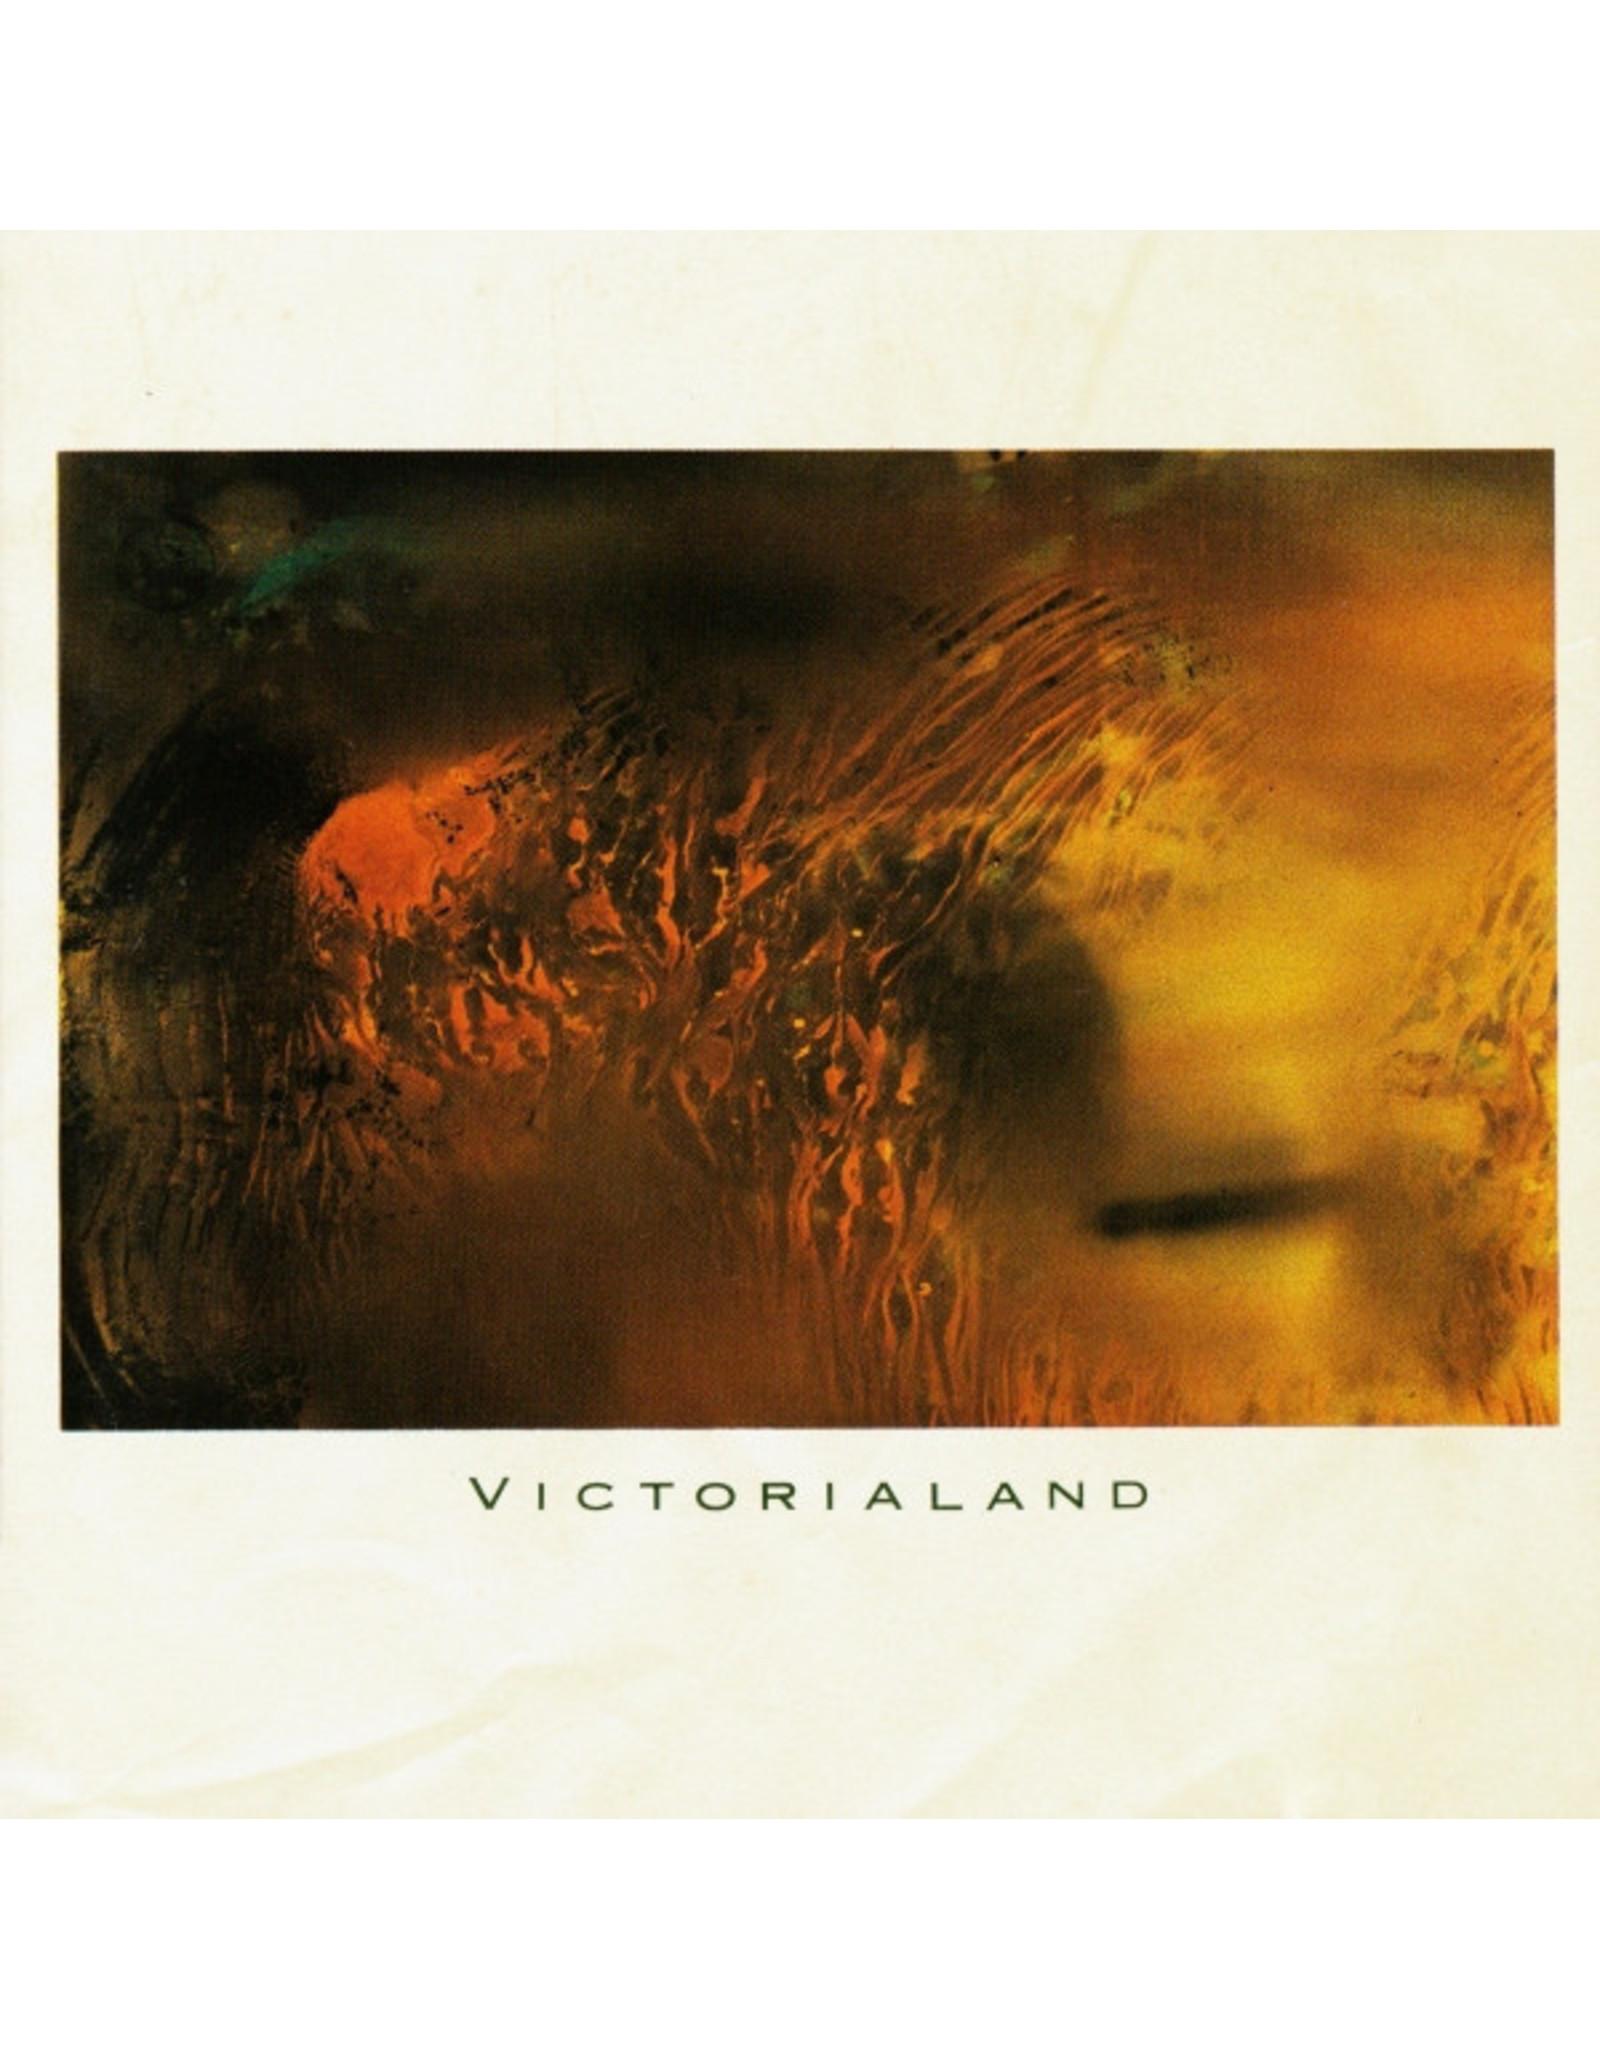 New Vinyl Cocteau Twins - Victorialand LP